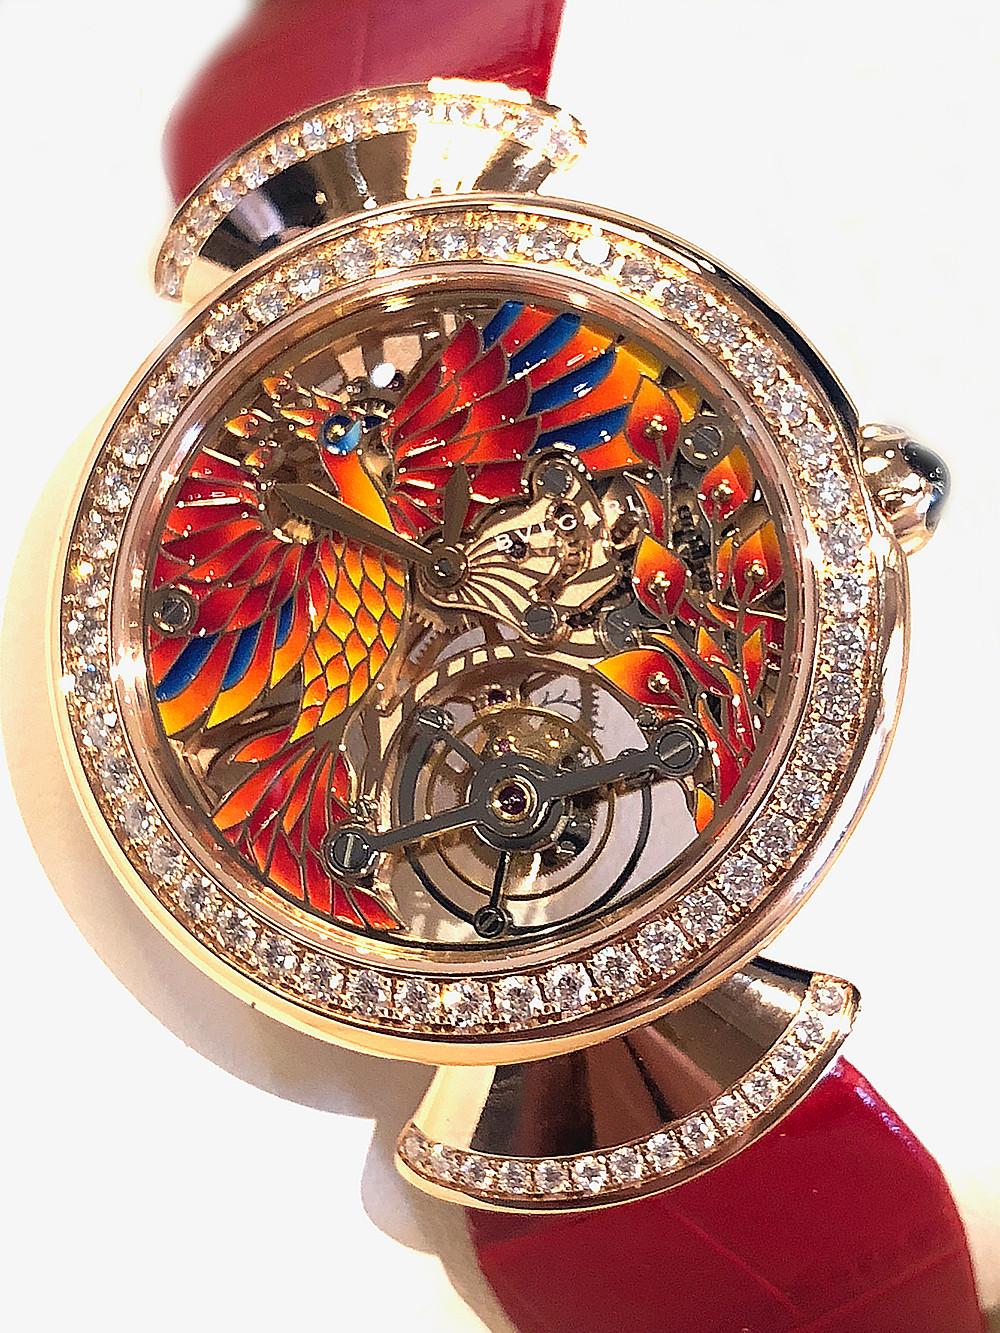 DIVAS' DREAM Tourbillon PHOENIX陀飛輪腕錶 37毫米直徑18k玫瑰金錶殼,錶耳鑲嵌上76顆明亮式切割鑽石(共重約1.76克拉),以人手繪上鳳凰與烈焰圖案的鏤空錶盤/時分指示/Calibre BVL 208型號人手上鍊陀飛輪機芯,64小時動力儲存/防水功能達30米,限量發售50枚